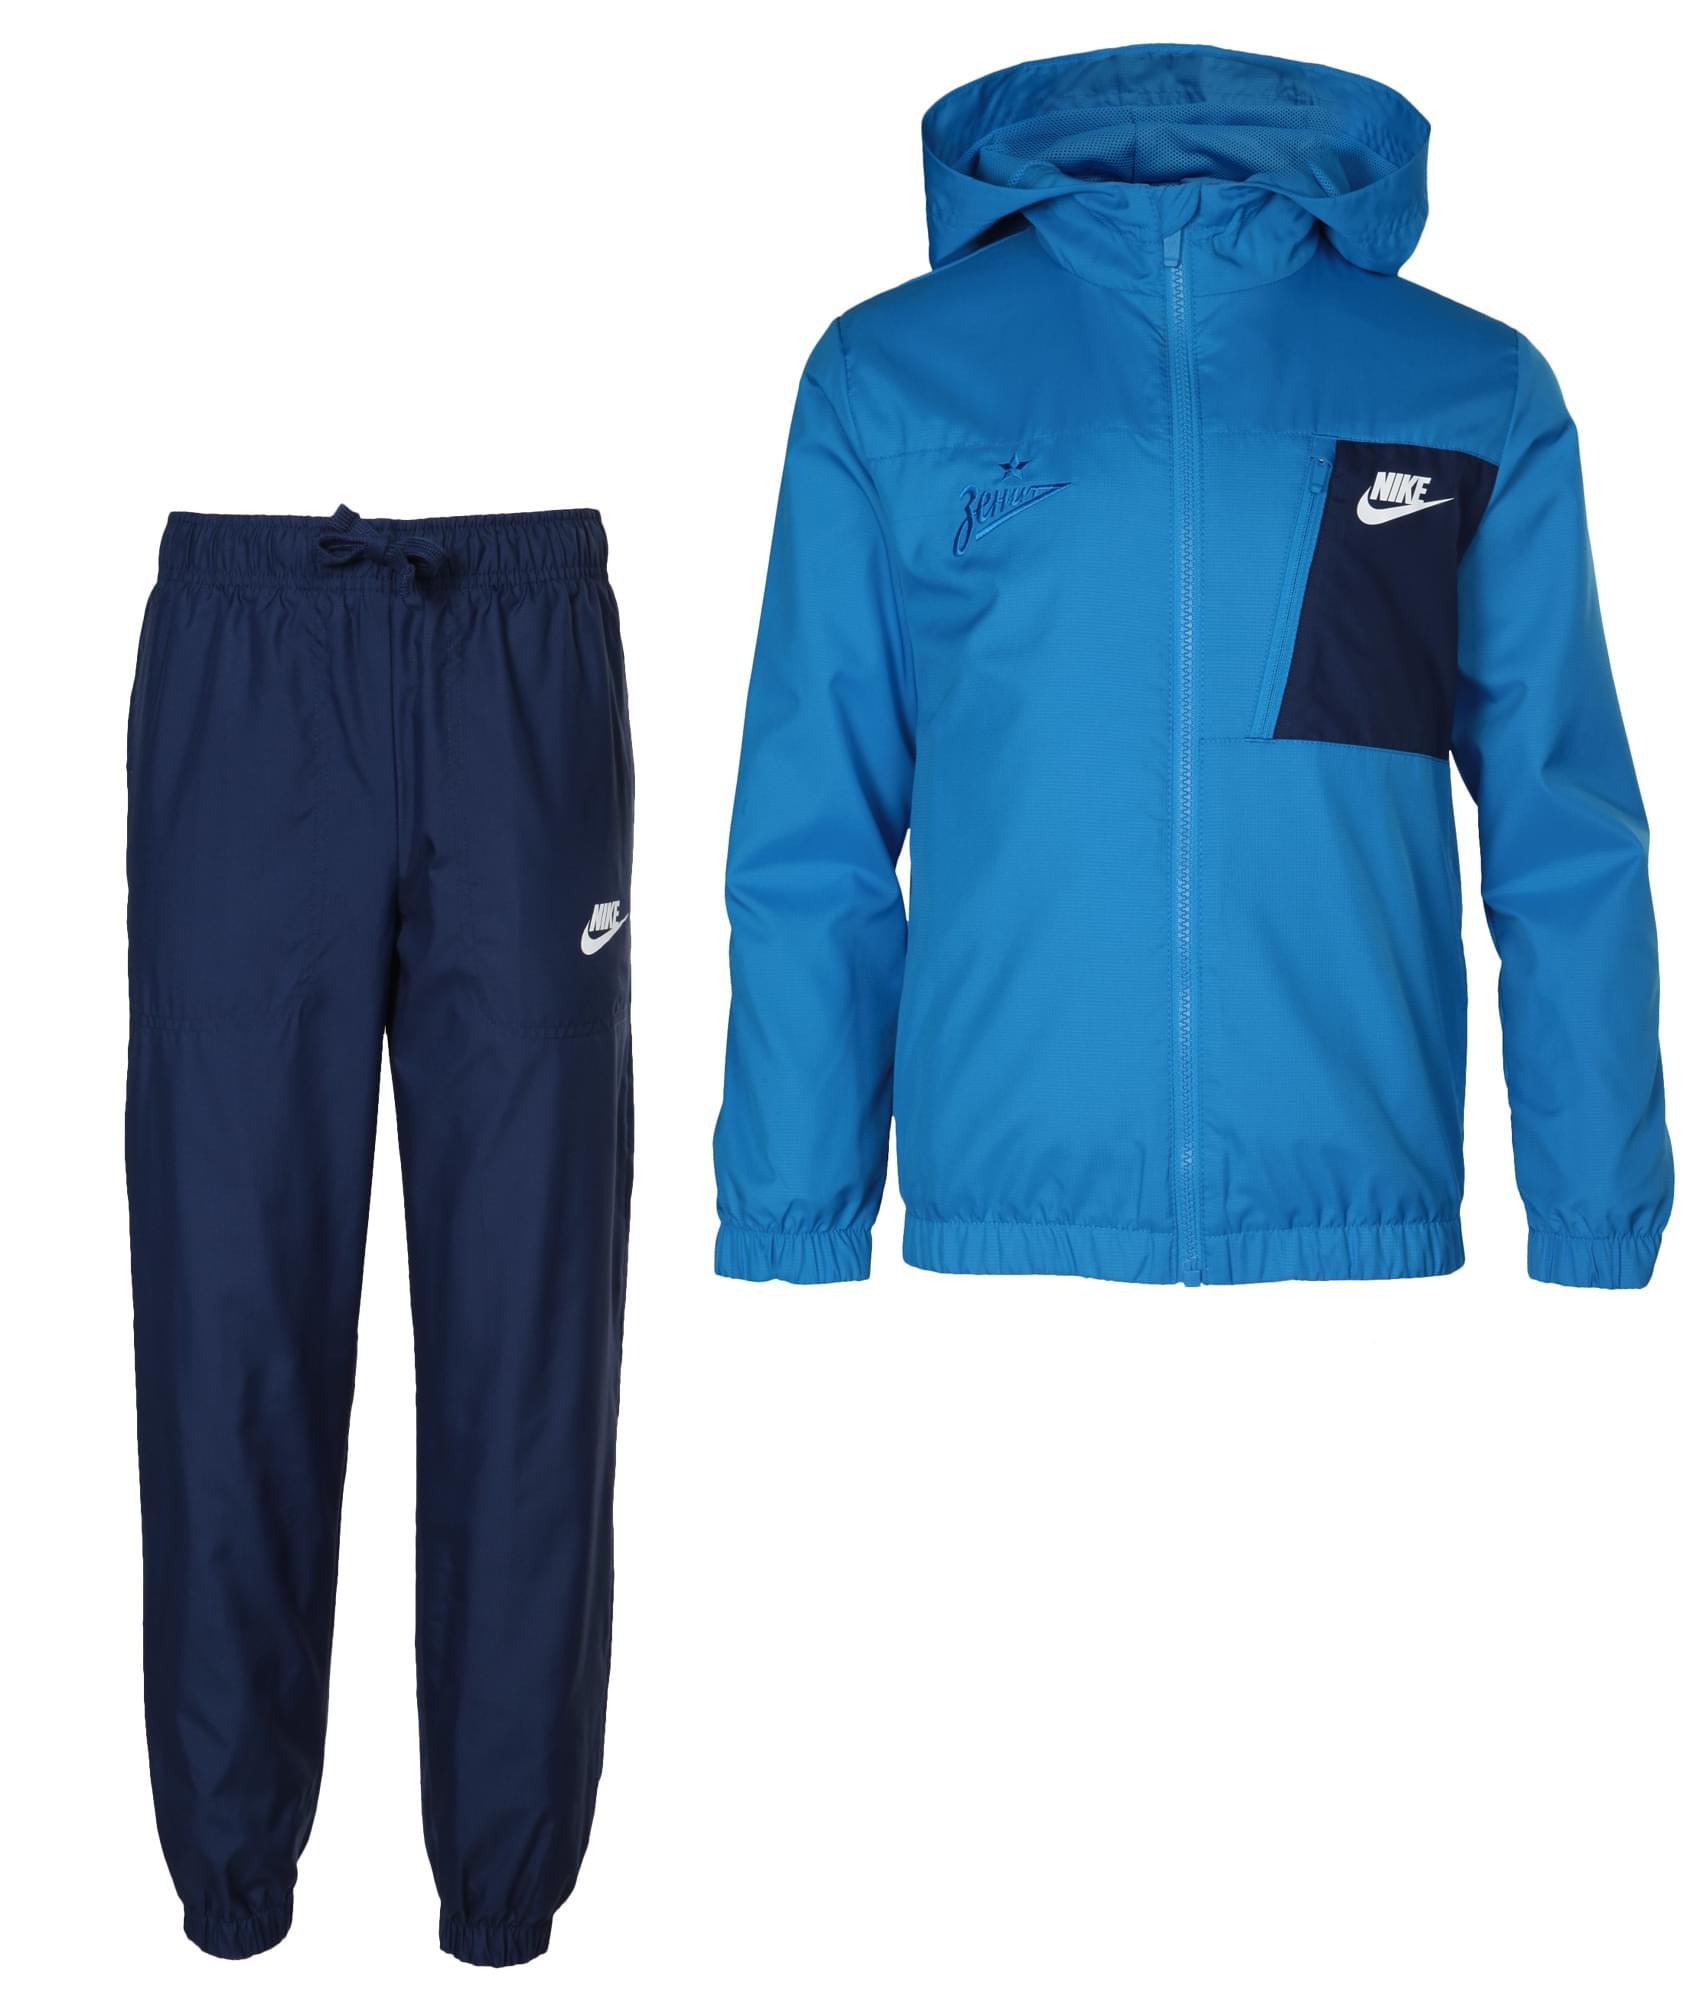 Подростковый спортивный костюм Nike, Цвет-Синий, Размер-S